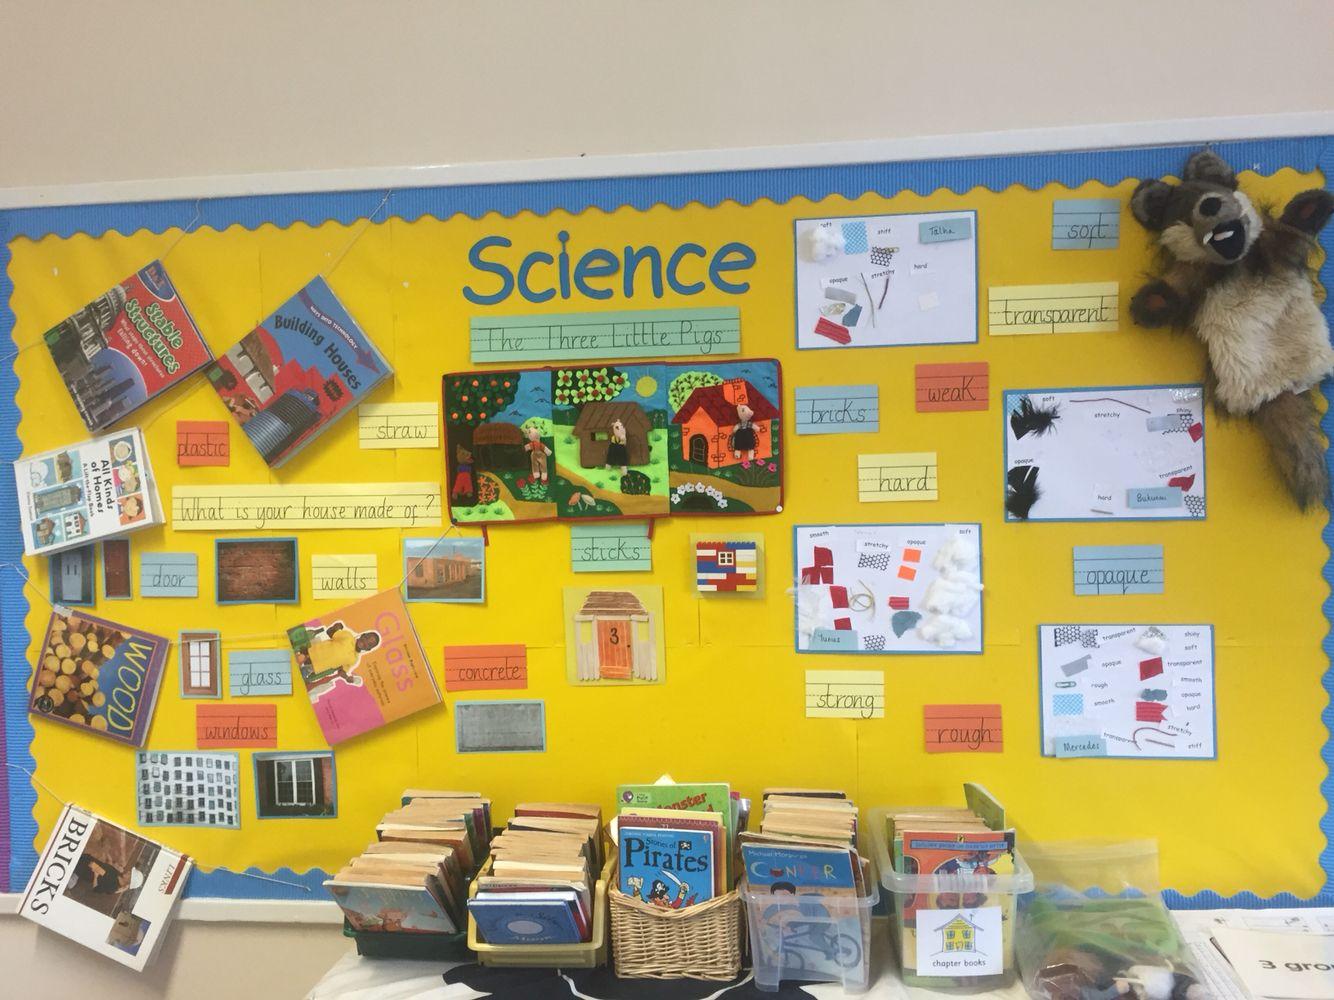 Classroom Display Ideas Ks1 ~ Ks materials three little pigs display school themes